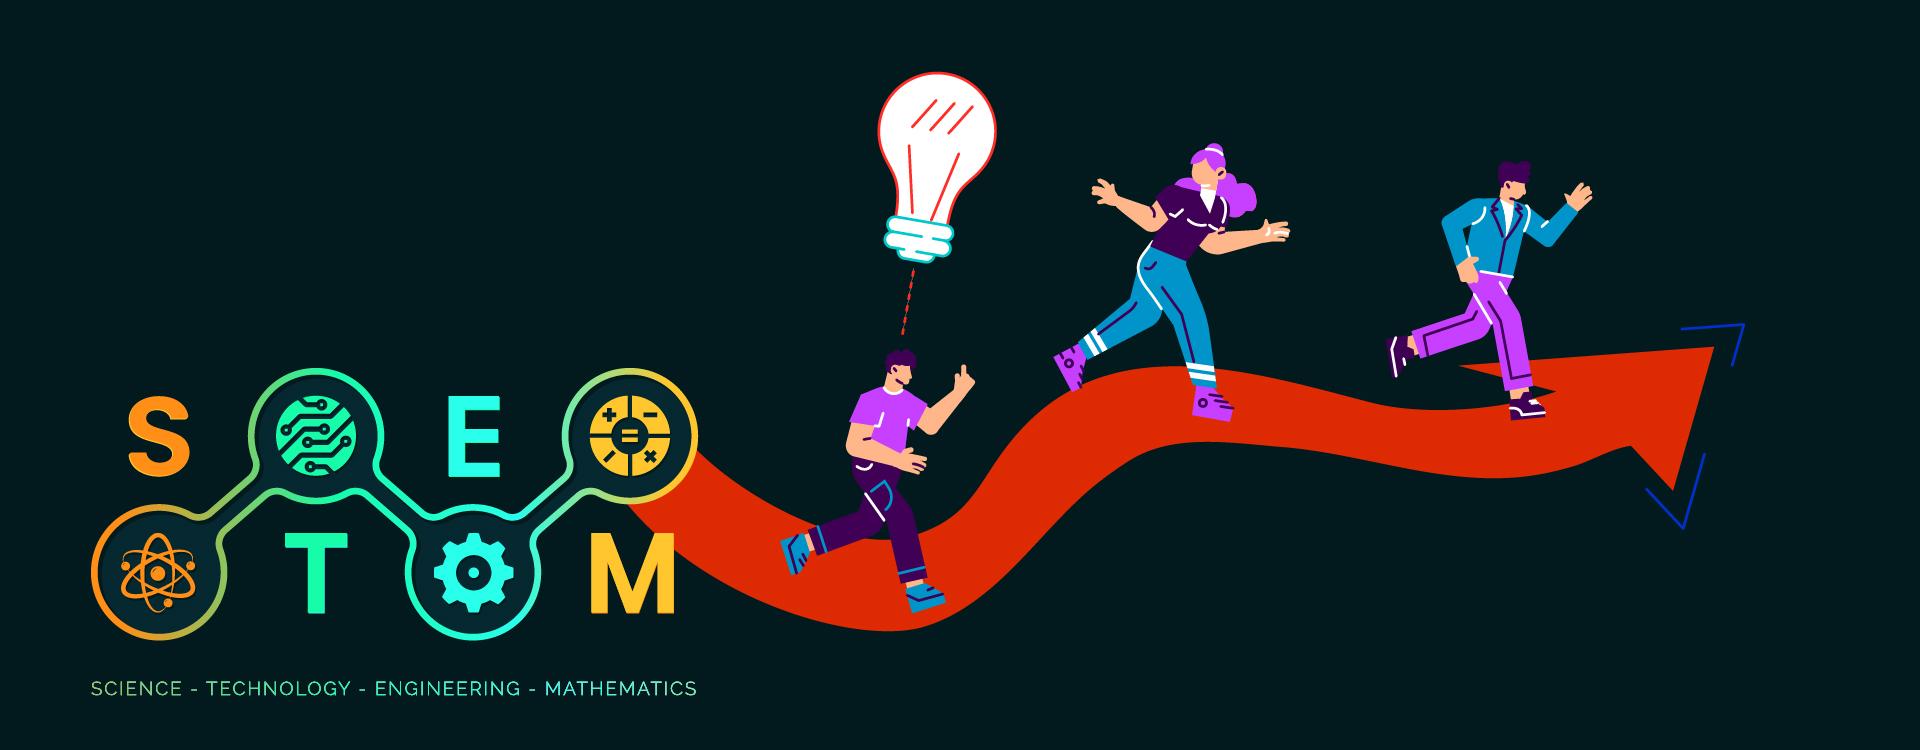 STEM Education and Business education entrepreneurship